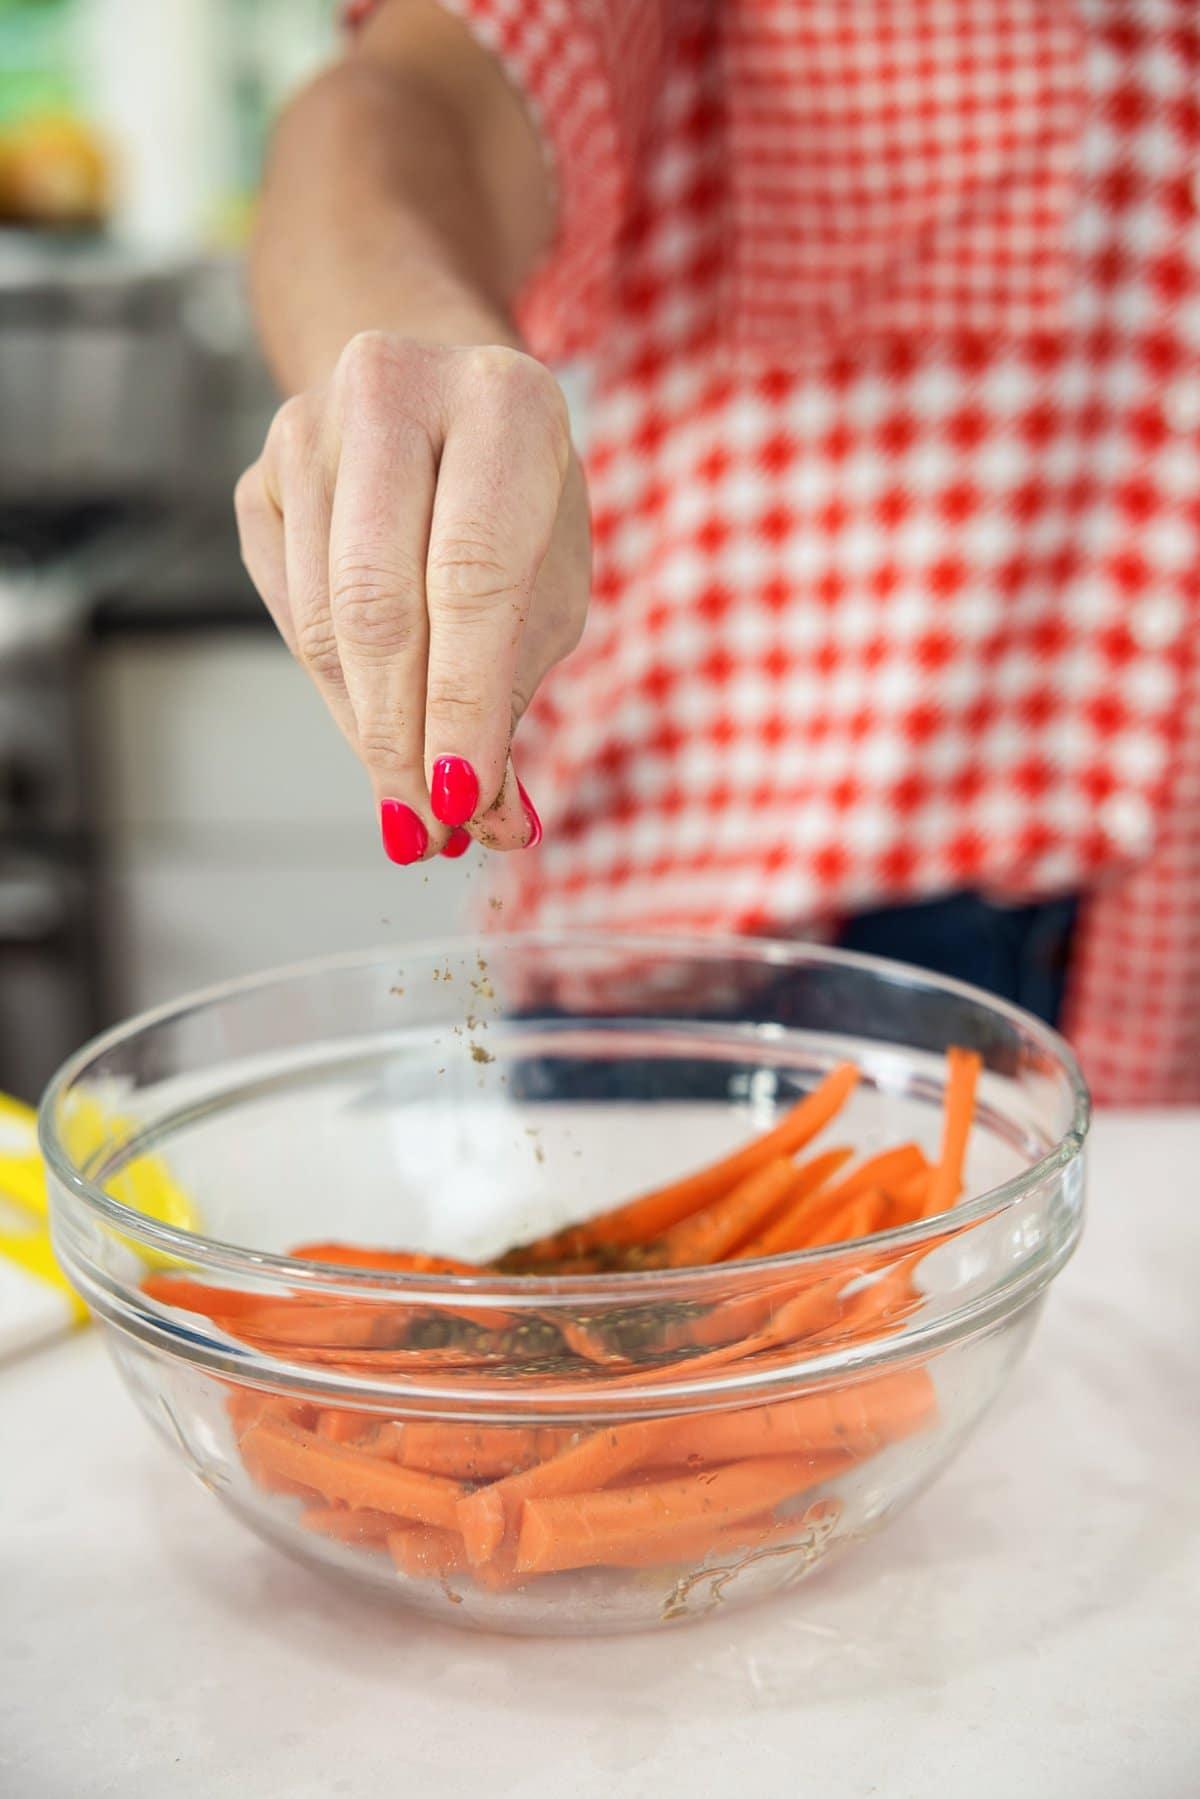 Liz sprinkling za'atar on carrots.